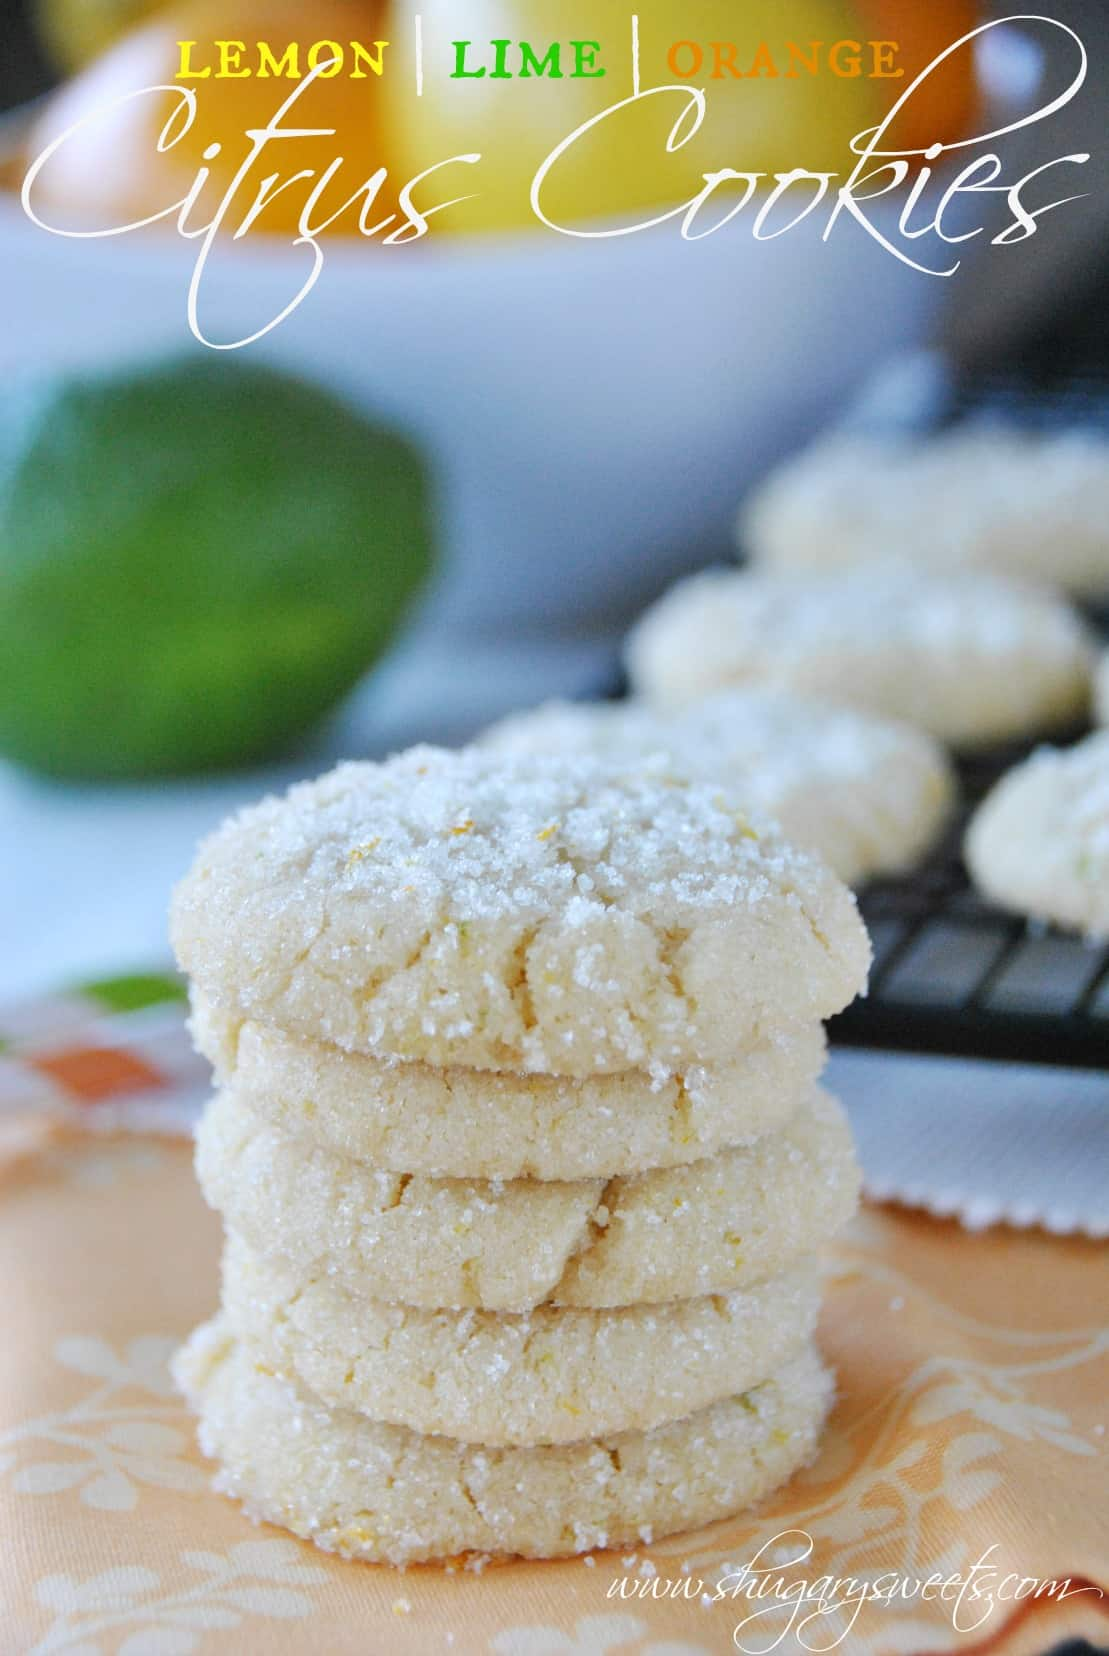 Shugary Sweets: Orange, Lemon And Lime Citrus Cookies